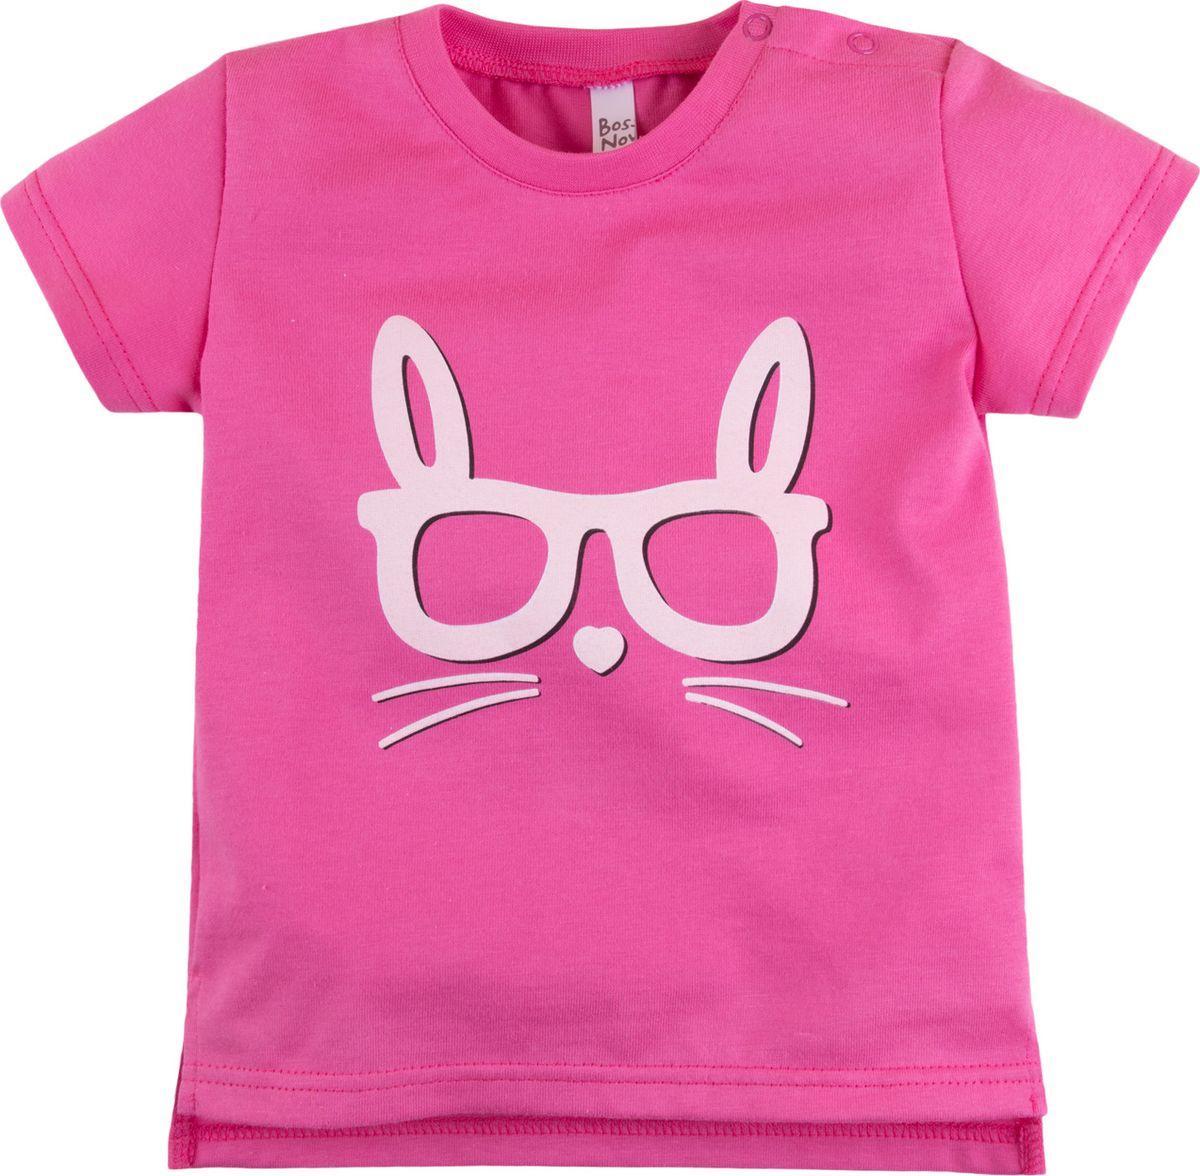 Футболка Bossa Nova Мокко футболка для девочки bossa nova мокко цвет бирюзовый 272б 161 размер 110